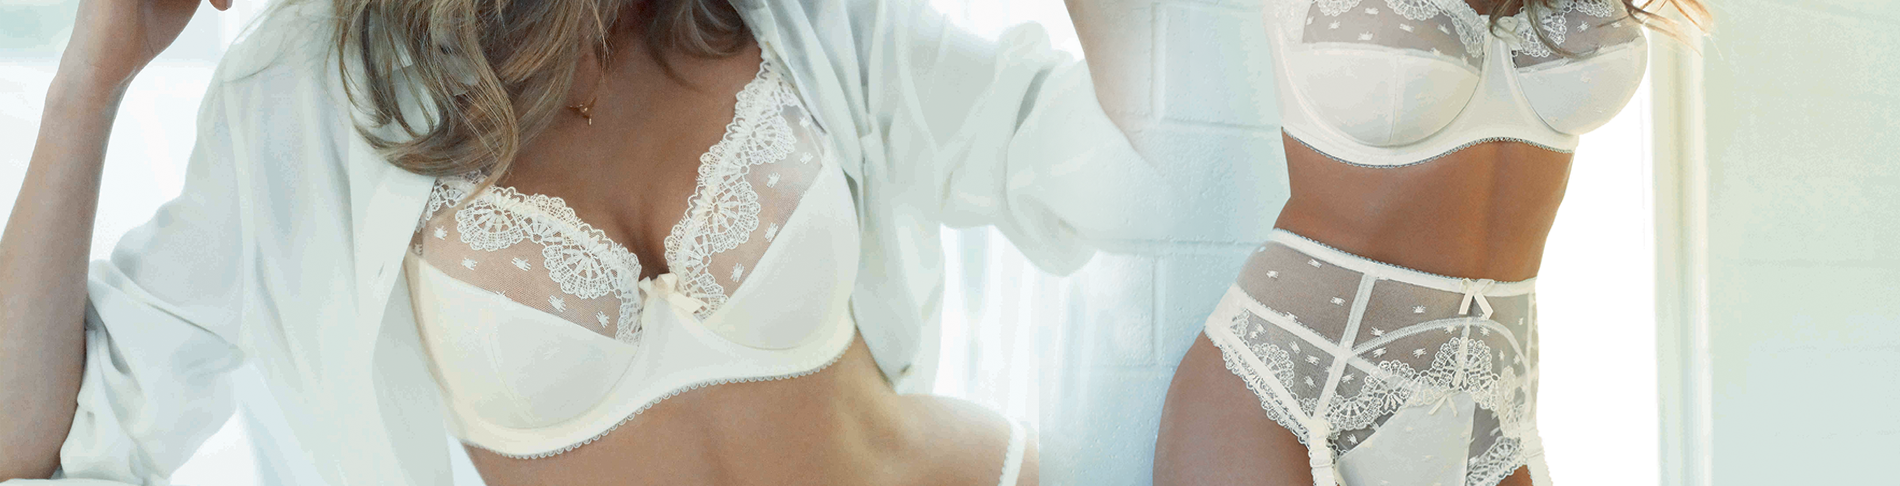 belle lingerie bridal lingerie buying guide